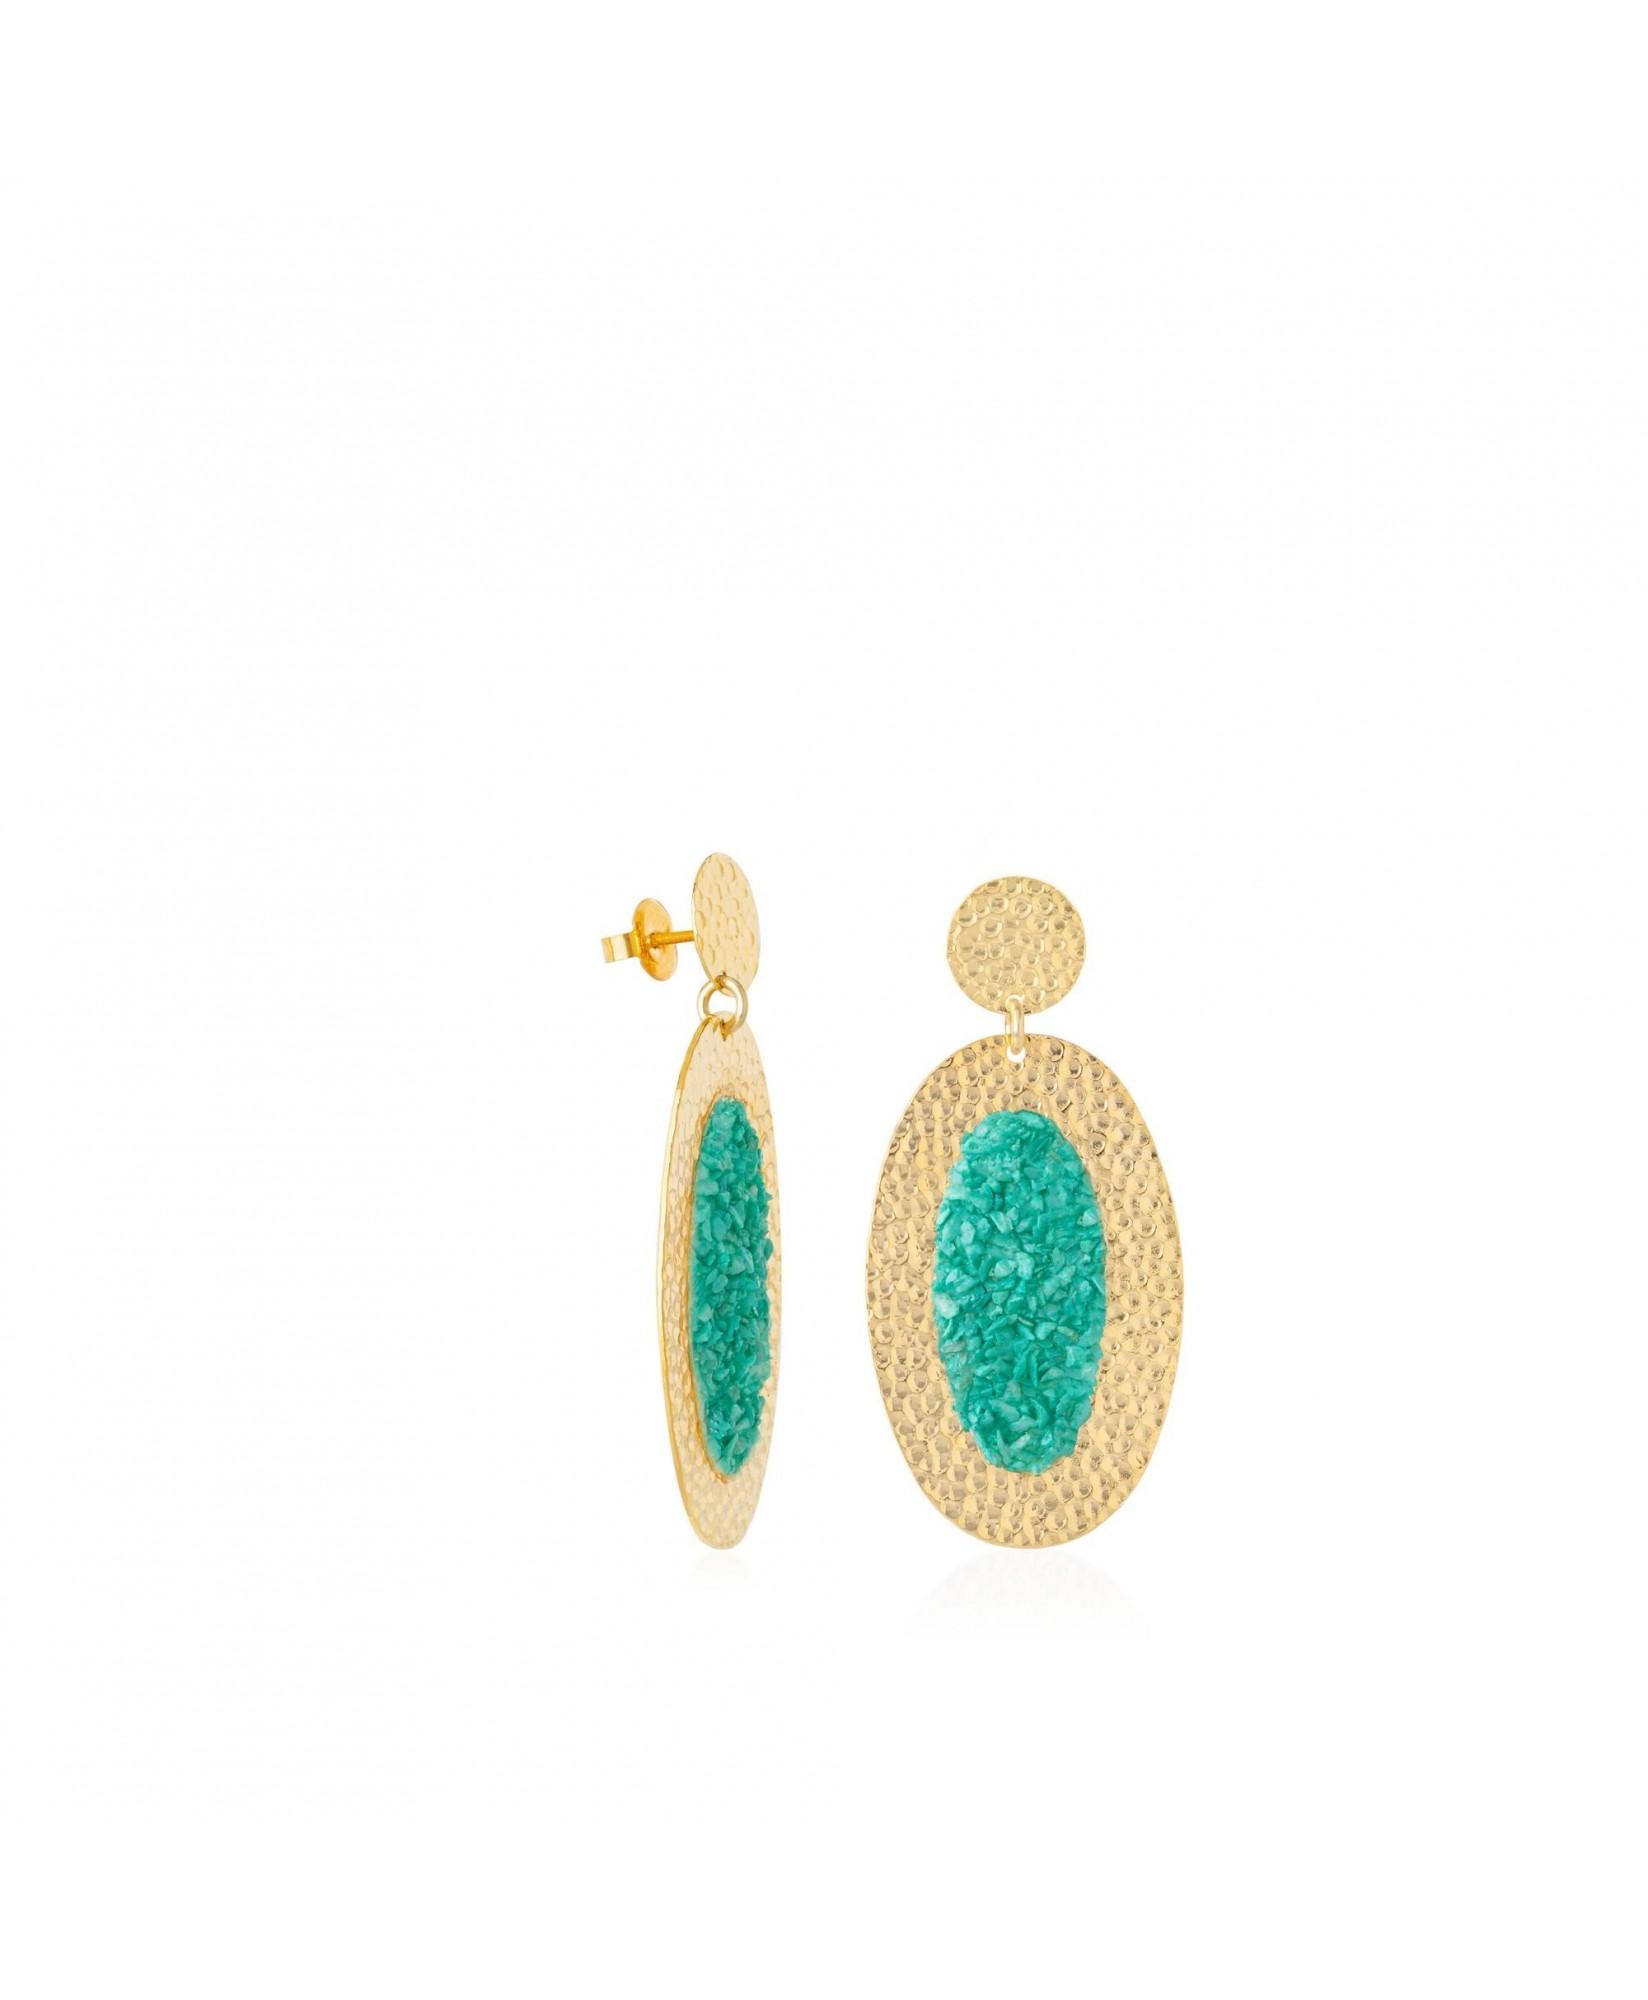 Pendientes ovalados oro Anais con piedra turquesa Pendientes ovalados oro Anais con piedra turquesa